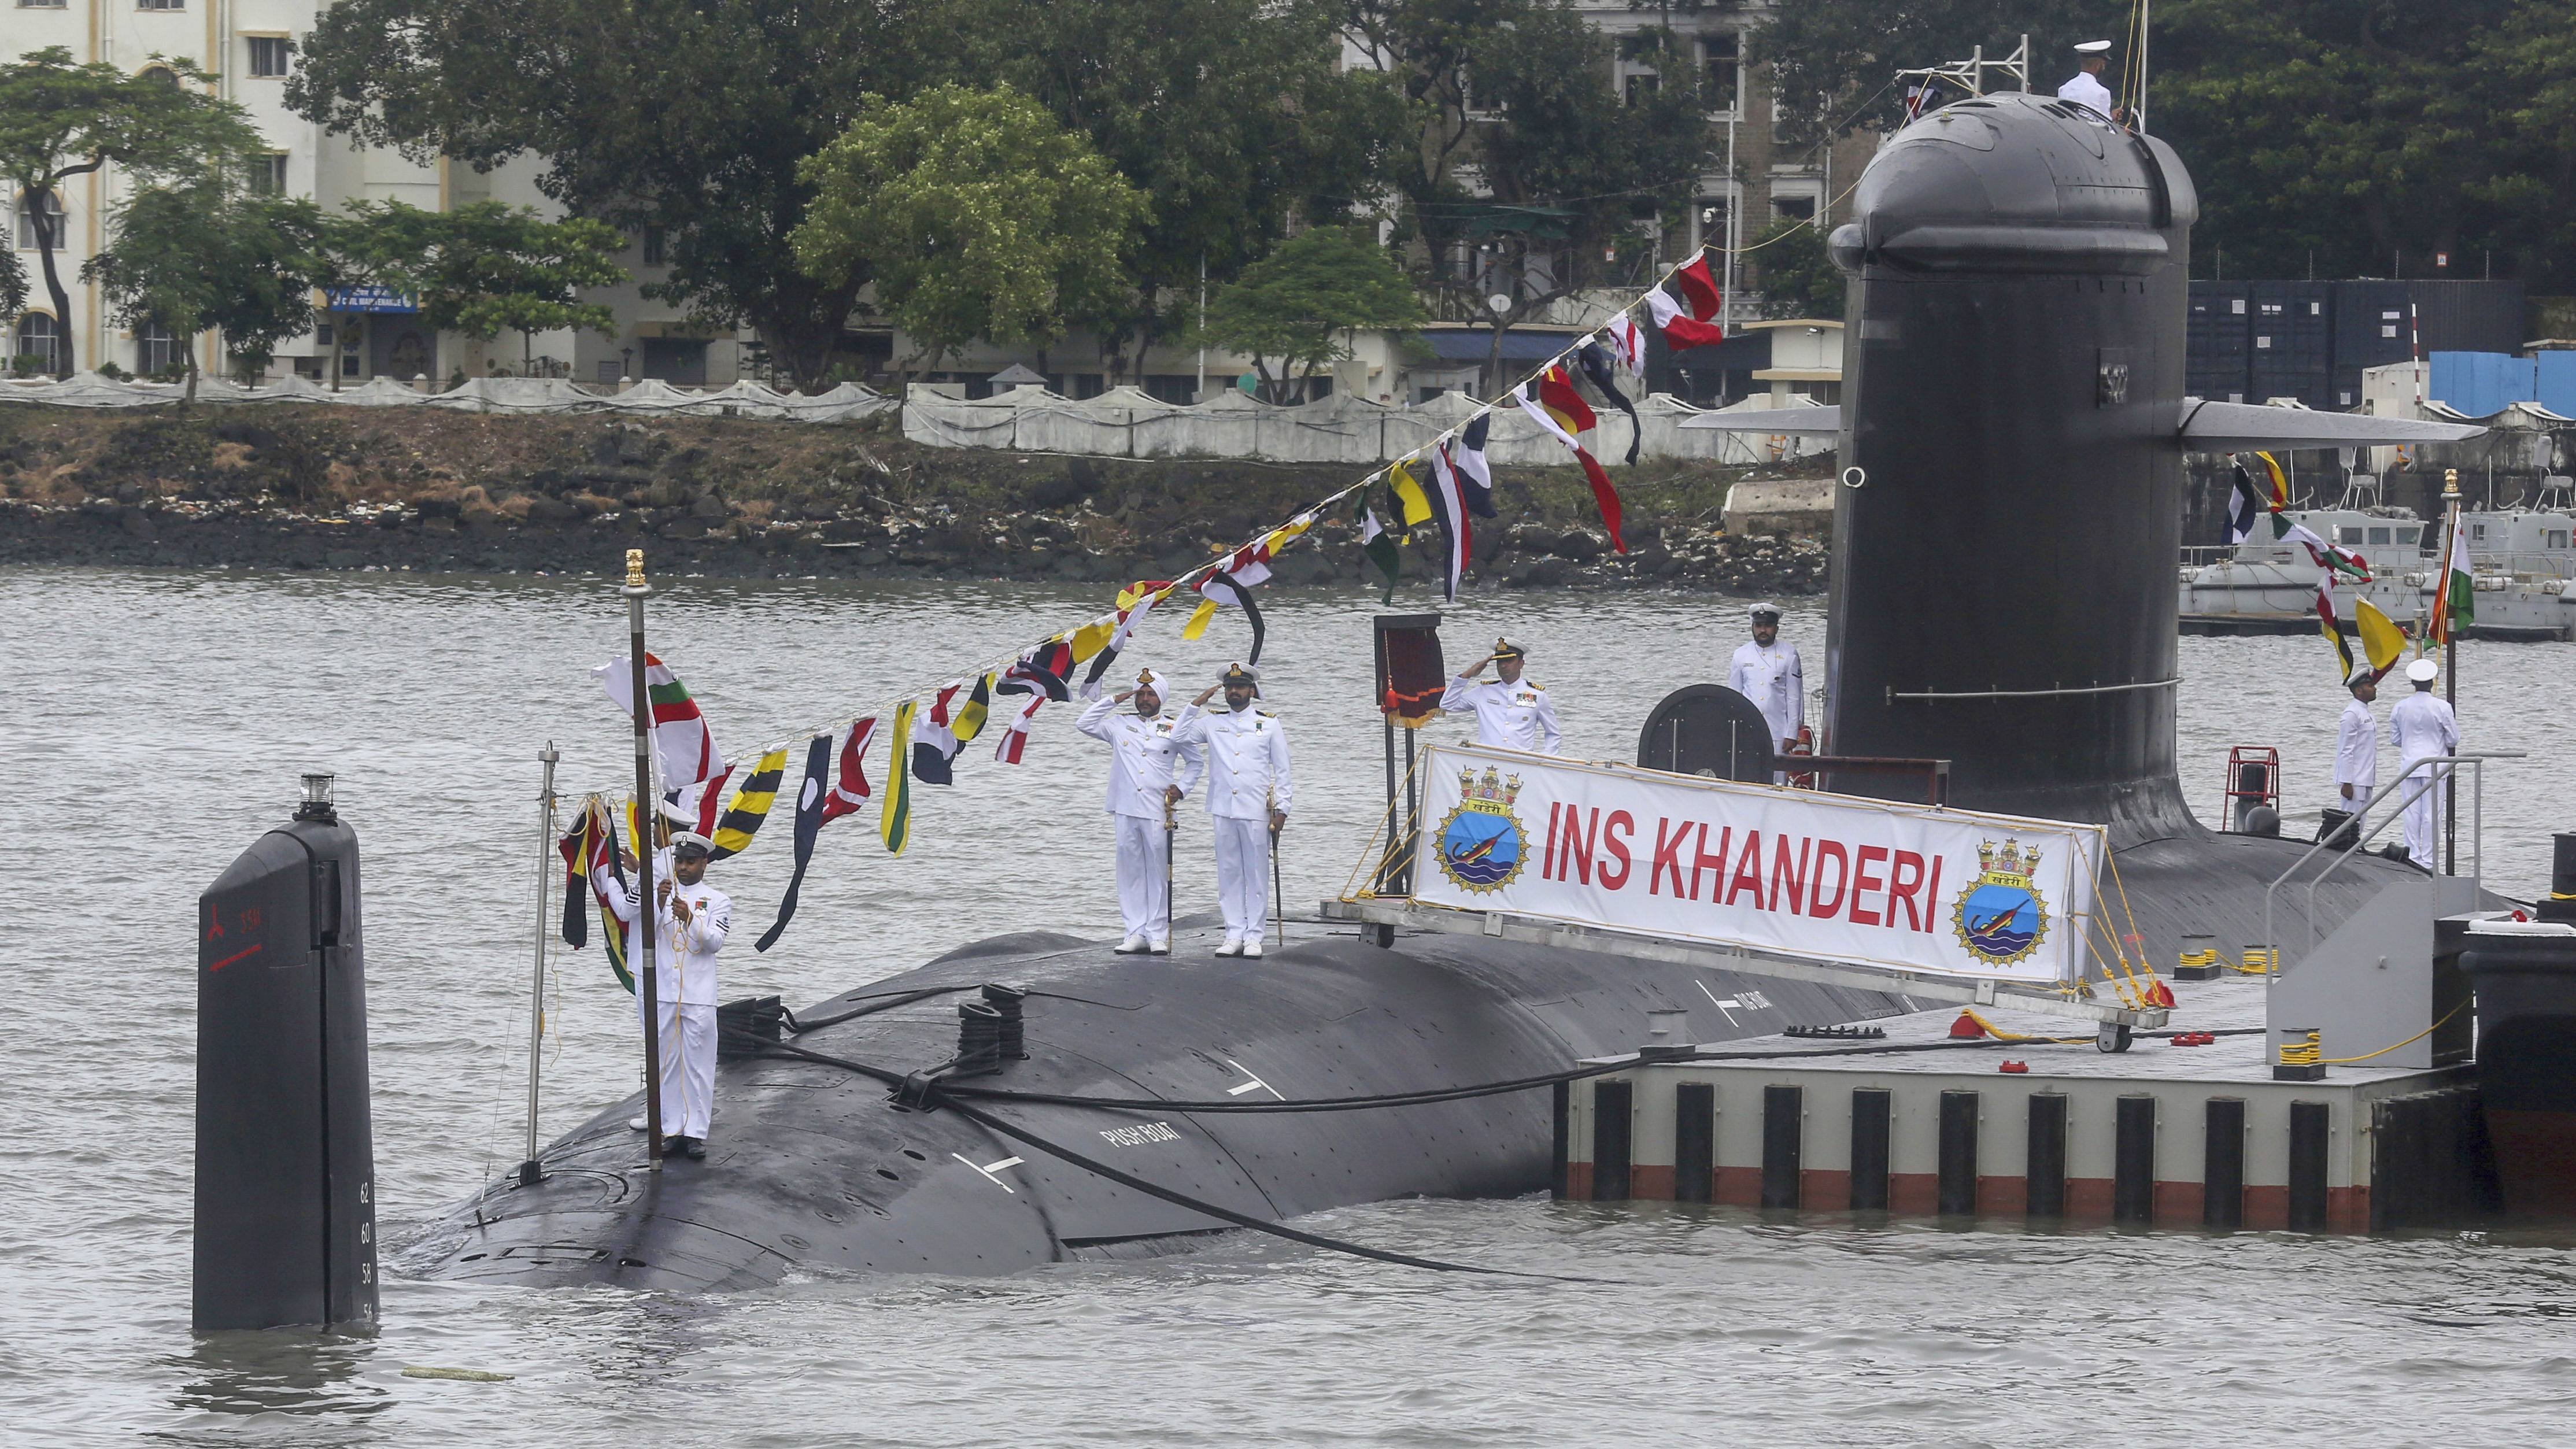 Indian navy sailors salute during the commissioning ceremony of the INS Khanderi, India's second Scorpene-class submarine, in Mumbai, India, Saturday, Sept. 28, 2019.. (AP Photo/Rafiq Maqbool)